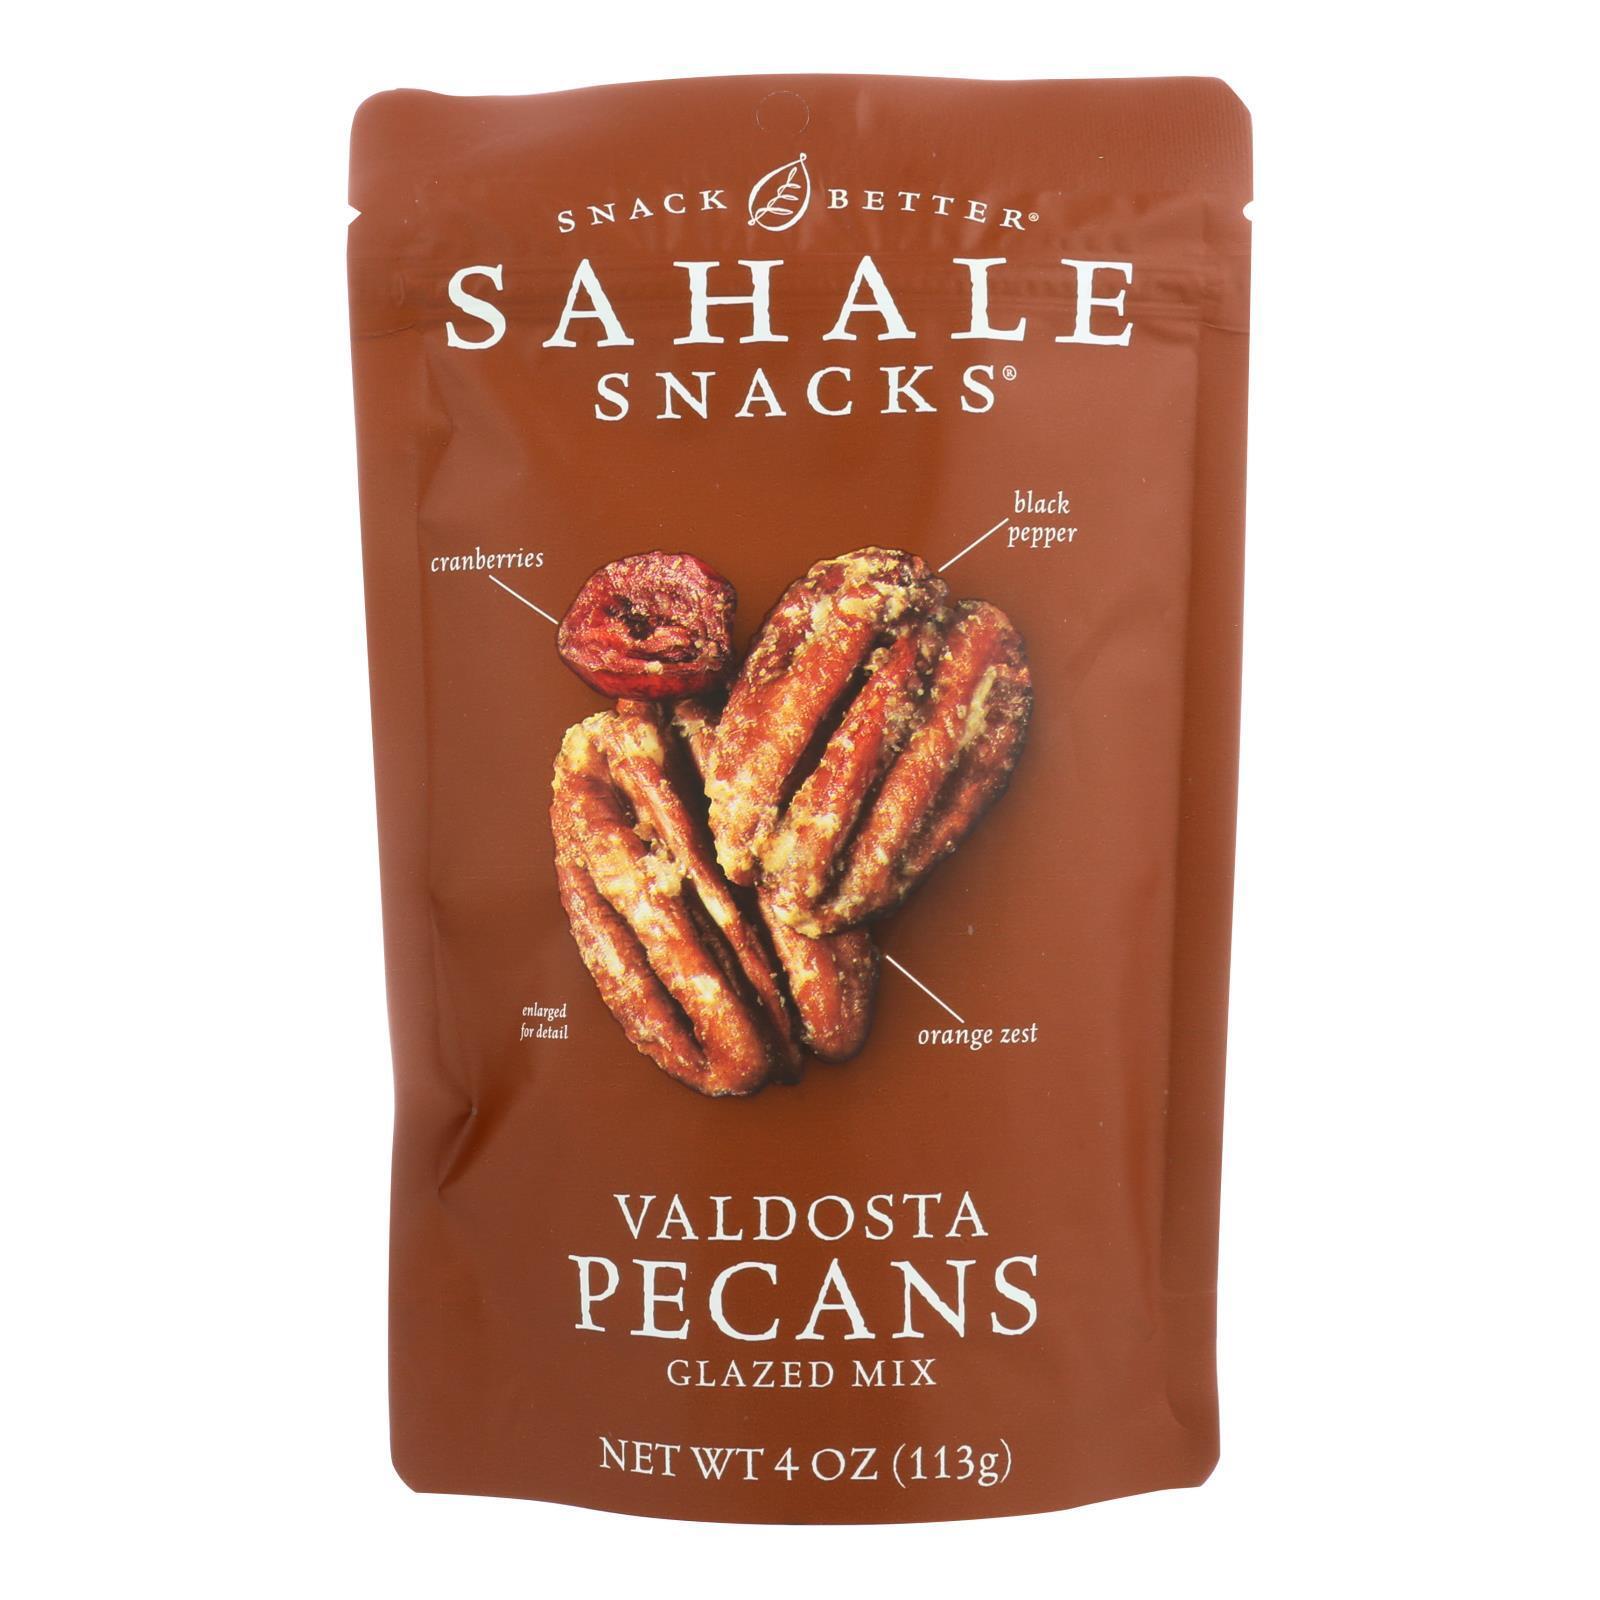 Sahale Snacks Valdosta Pecans Glazed - Mix - Case of 6 - 4 oz.